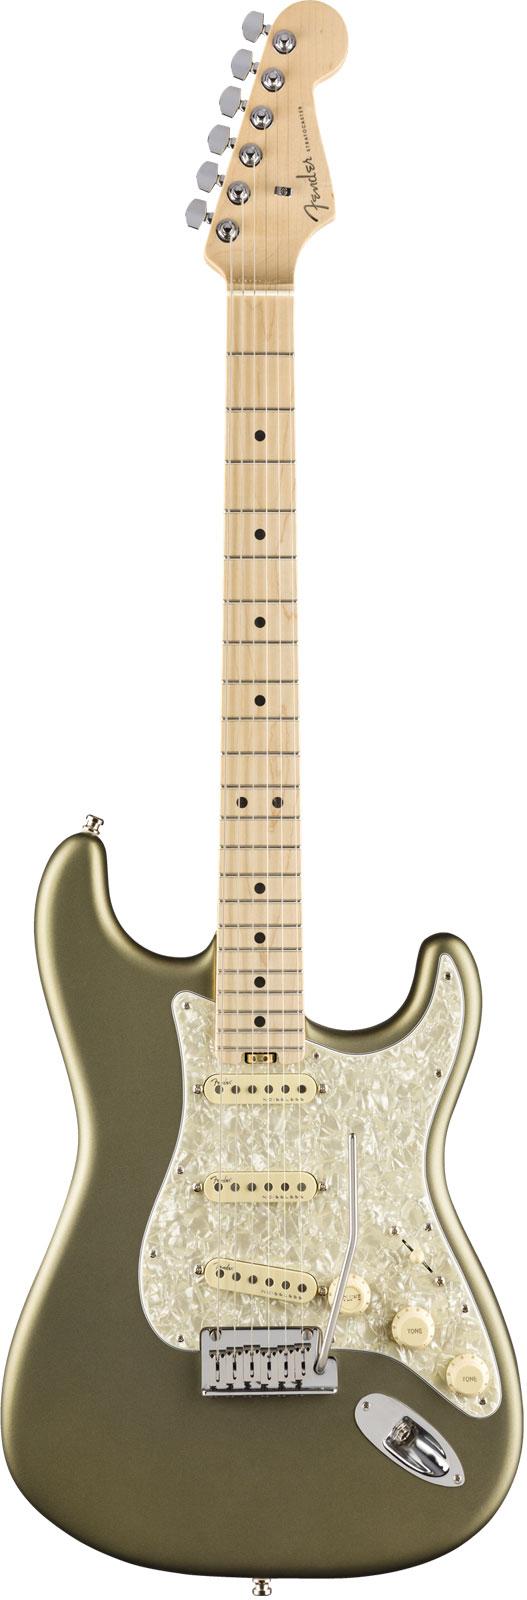 Fender American Elite Stratocaster Mn Satin Jade Pearl Metallic